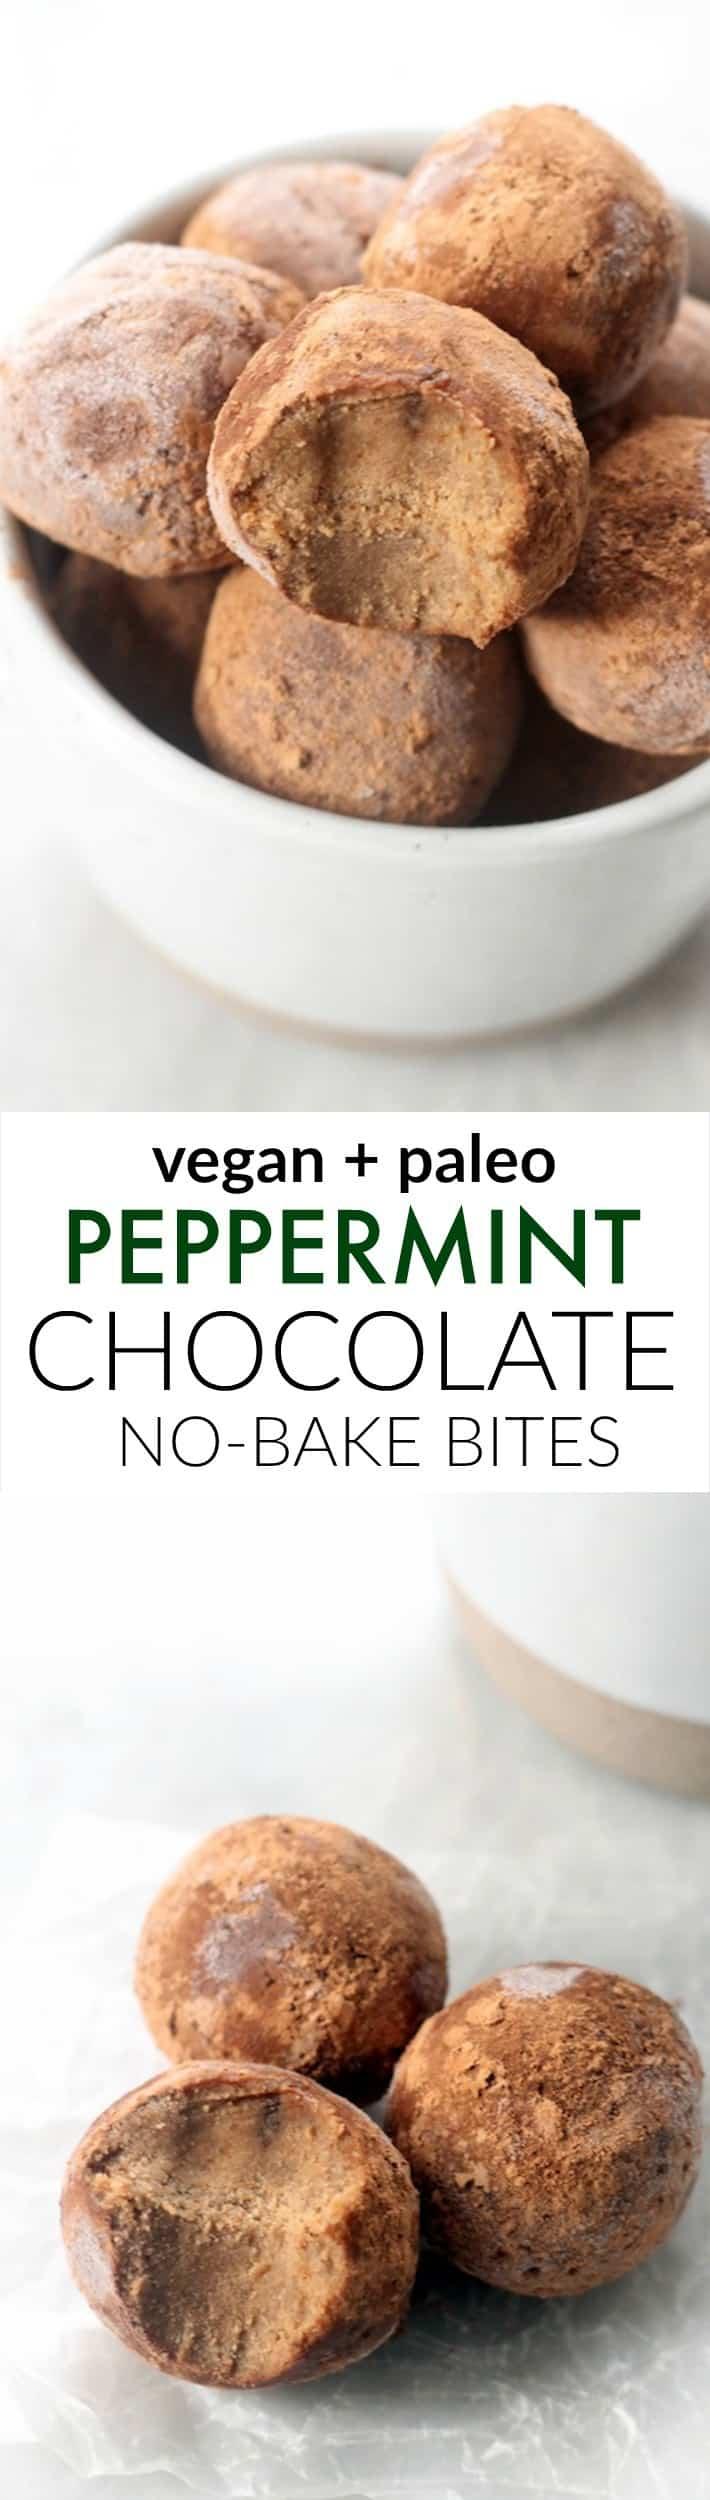 Peppermint Chocolate No-Bake Bites (Paleo, Vegan)